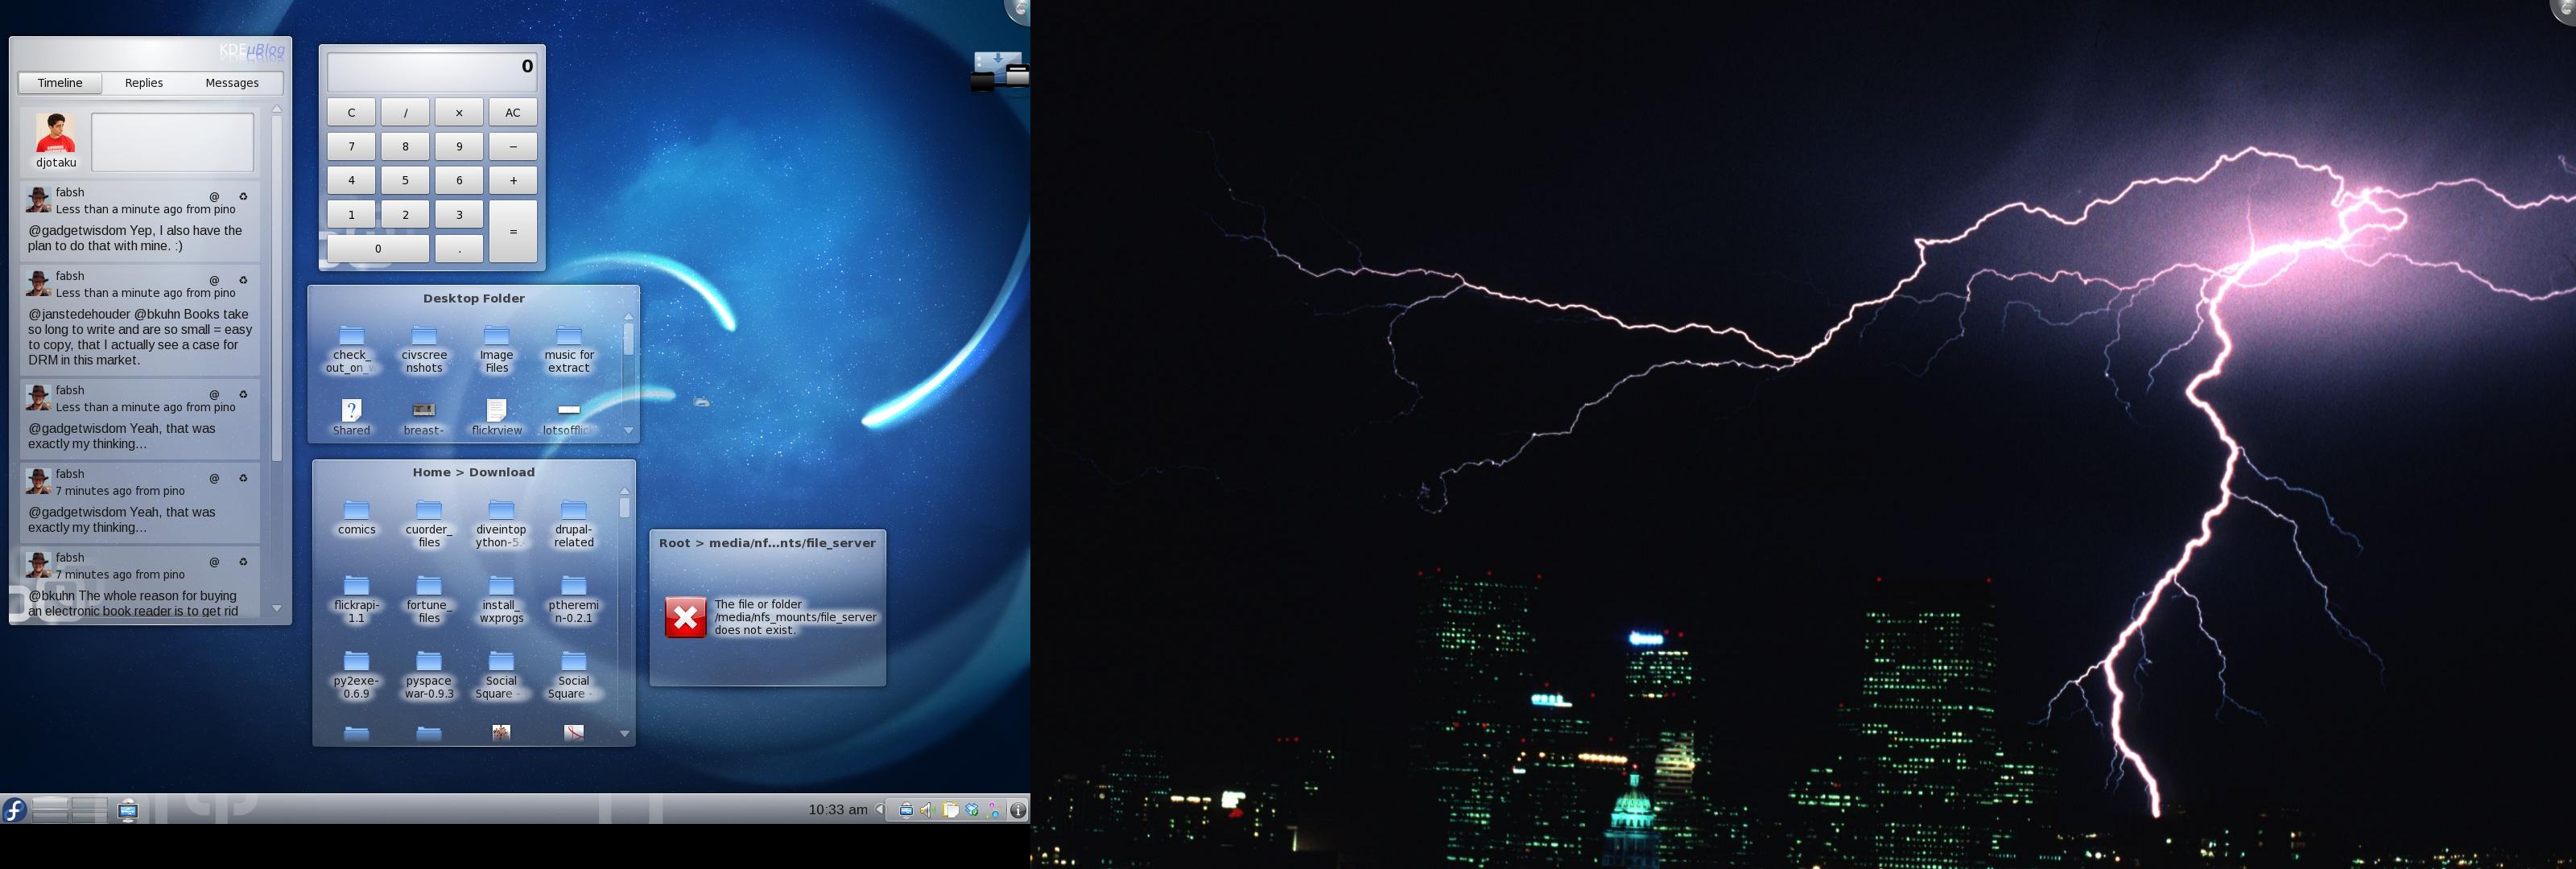 change my desktop wallpaper 3200x1080